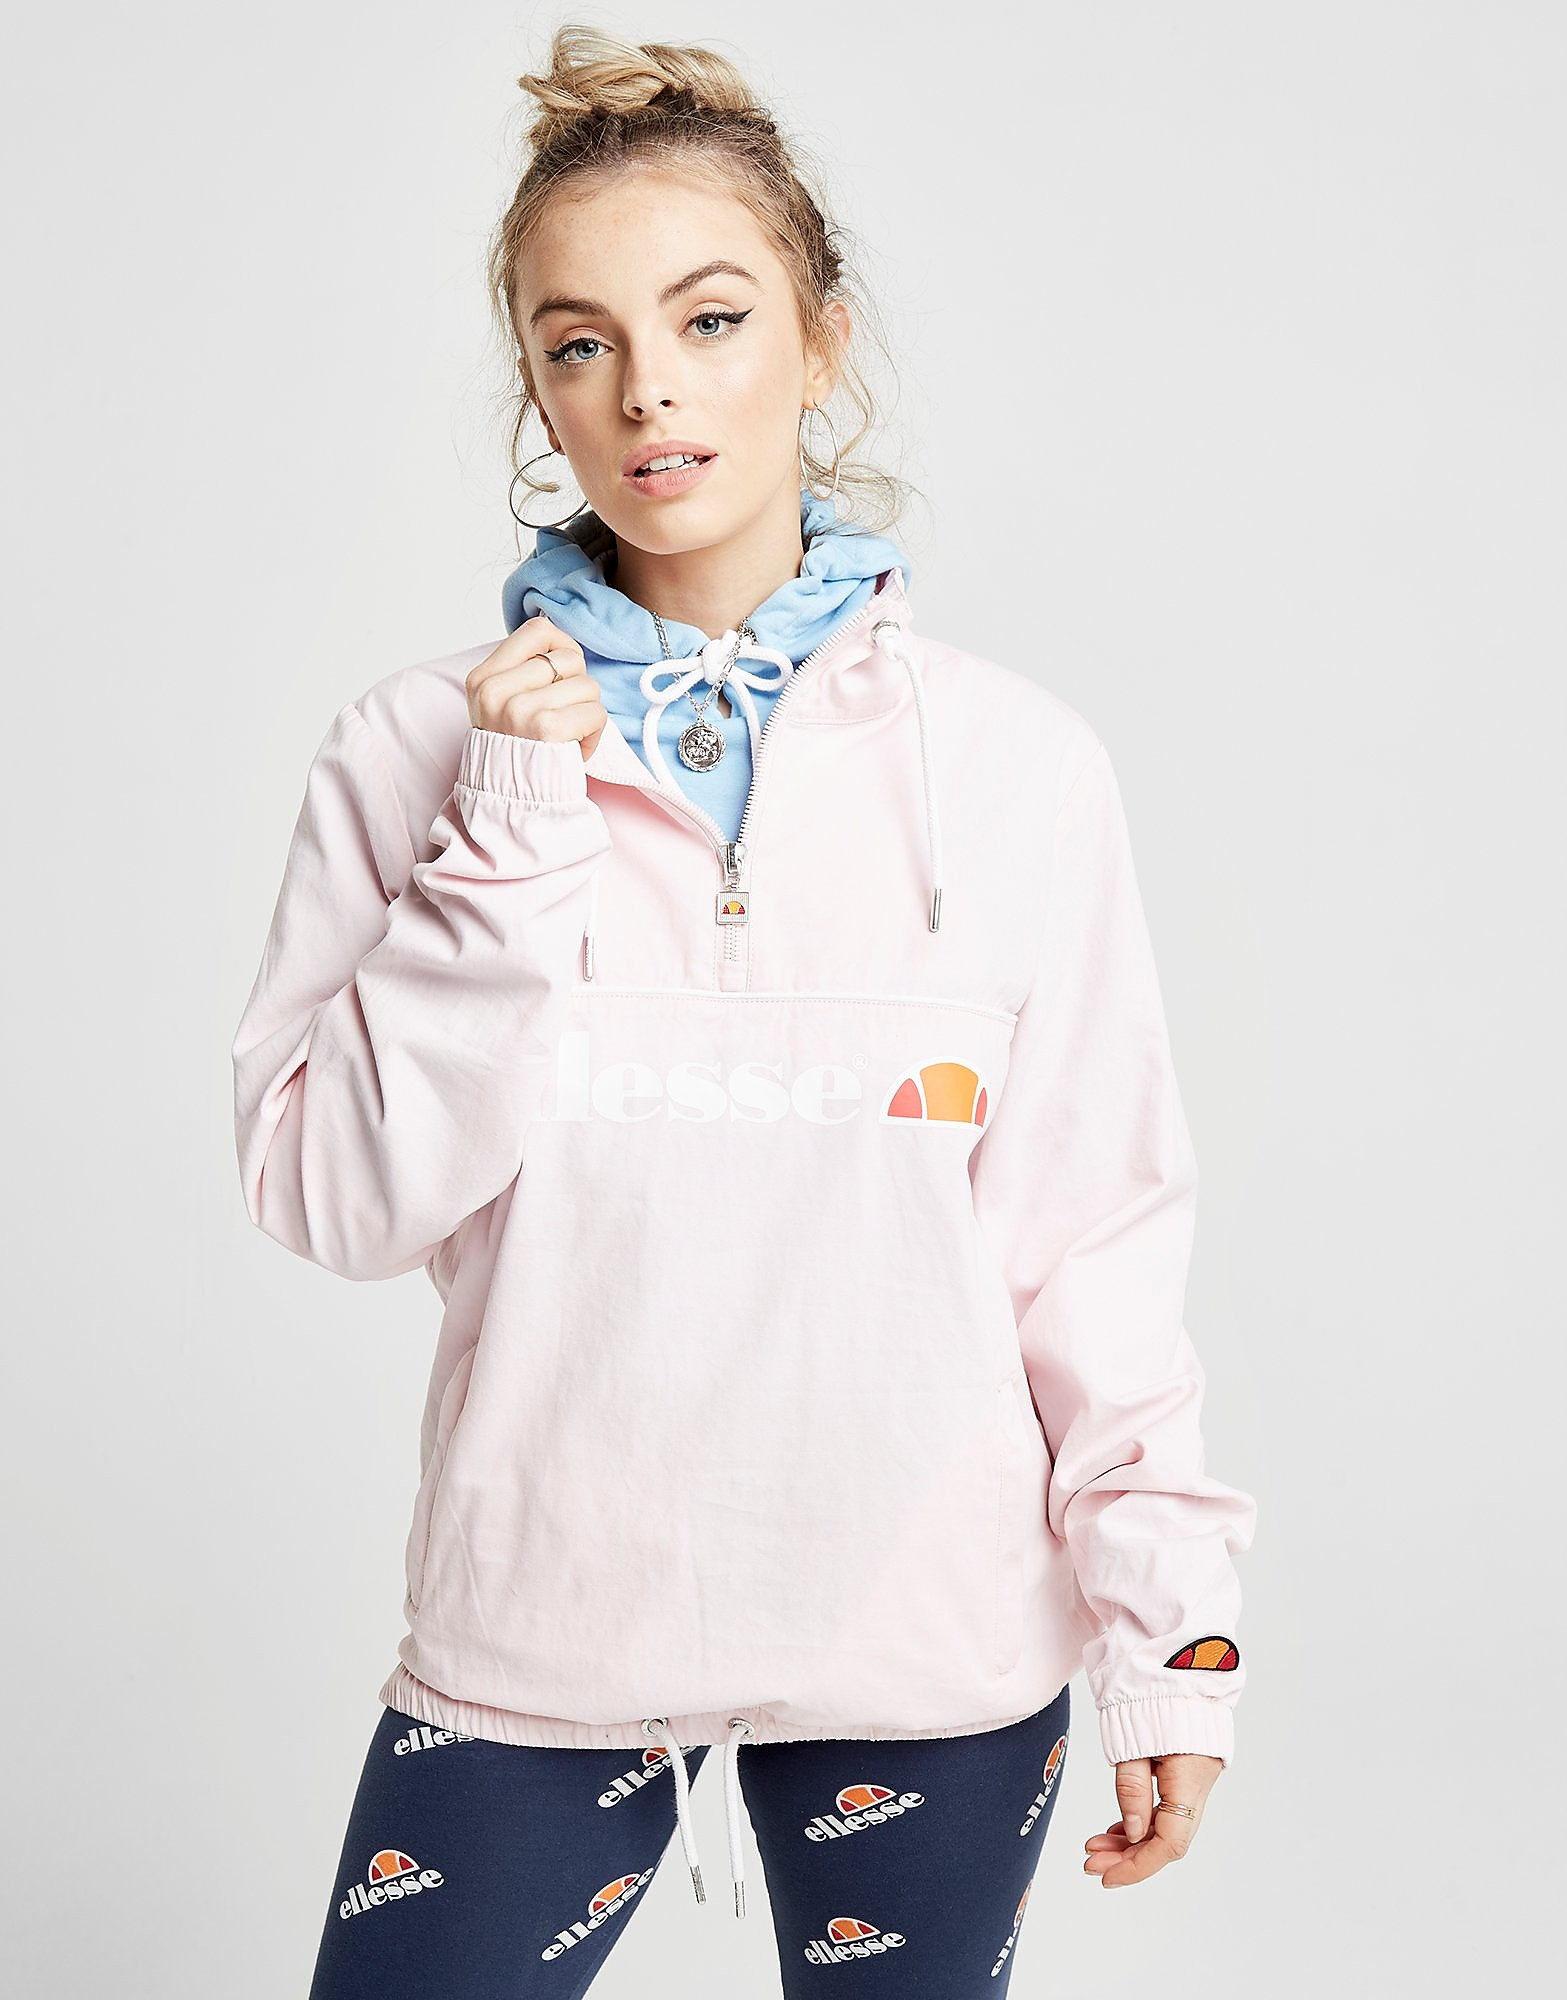 Ellesse 1/4 Zip Logo Jacket